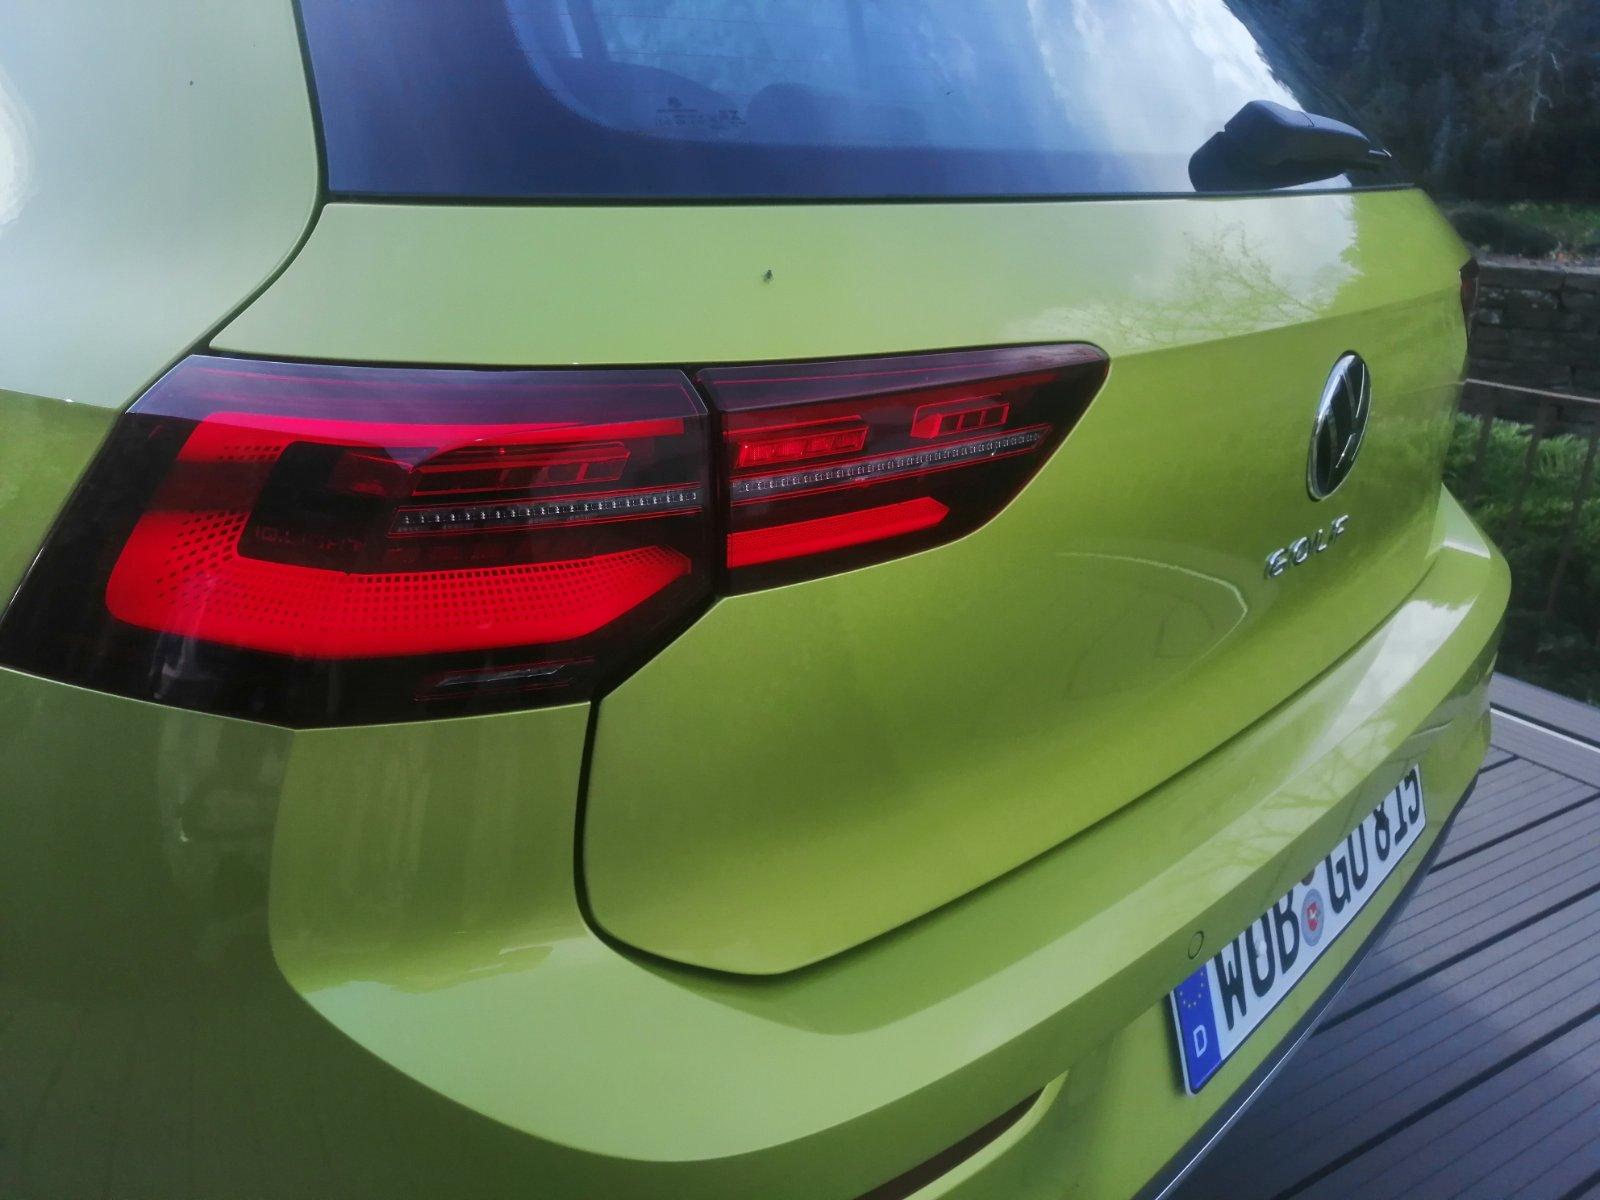 VW Golf Mk8 - Porto